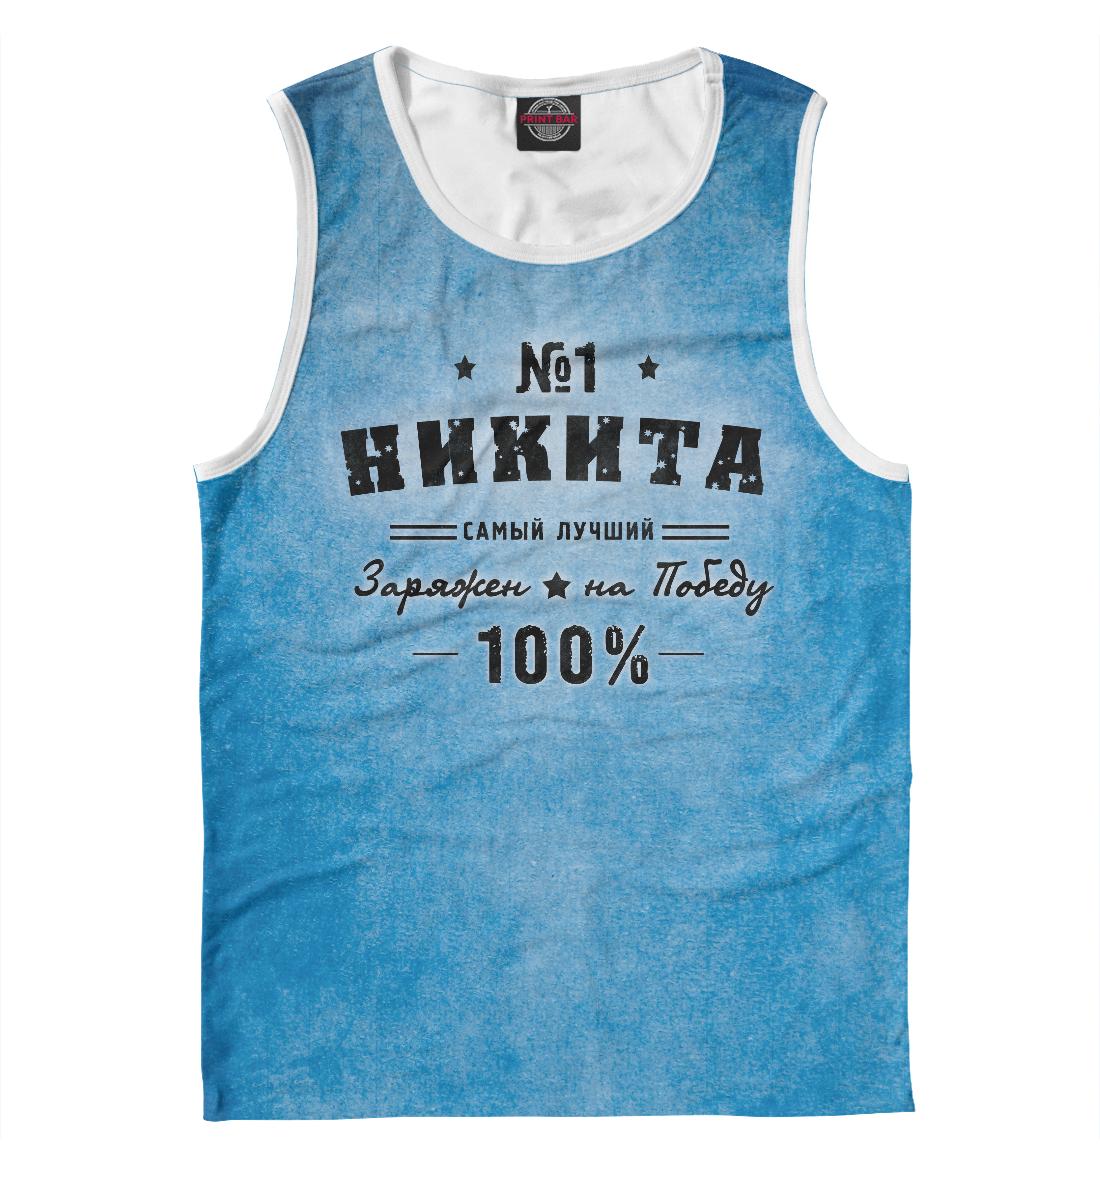 Купить Никита заряжен на победу, Printbar, Майки, NIK-494343-may-2